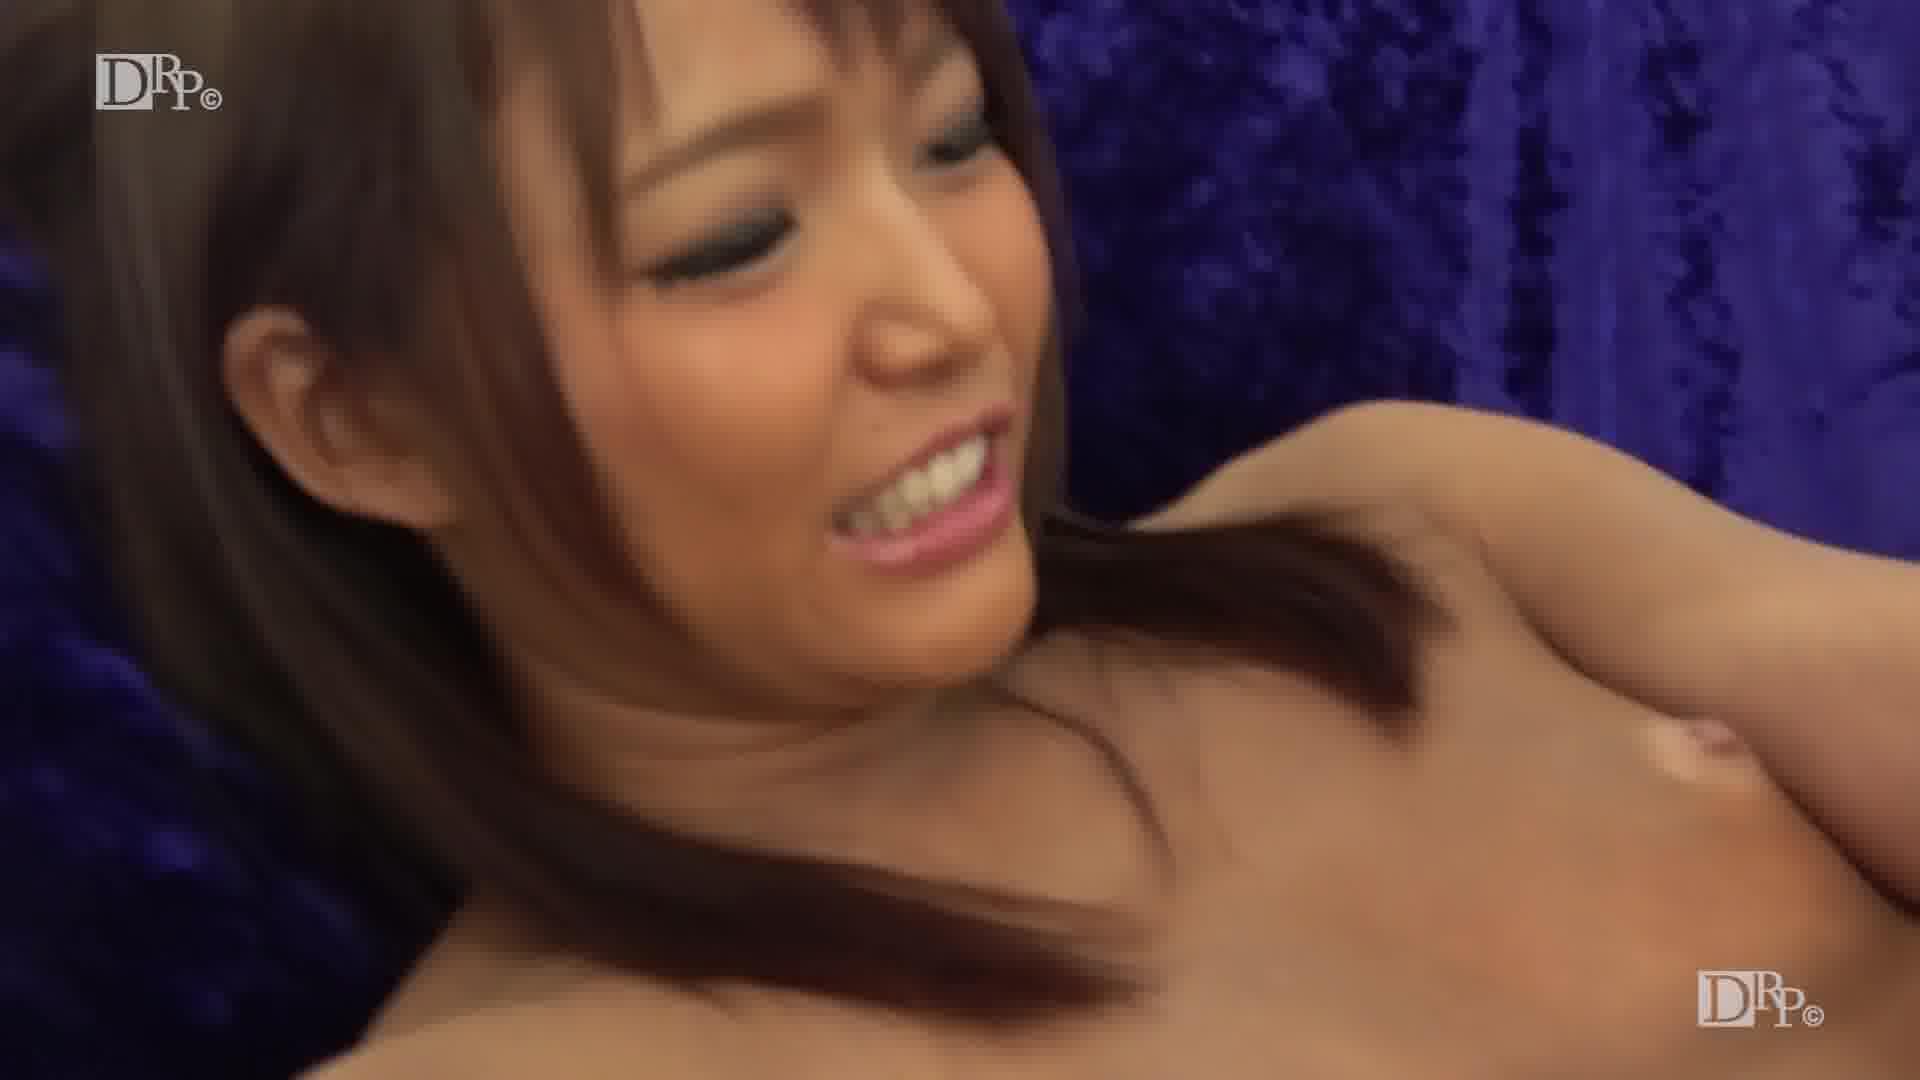 THE 未公開 ~恥じらいのお漏らし大作戦11~ - ちひろ【巨乳・放尿・美尻】